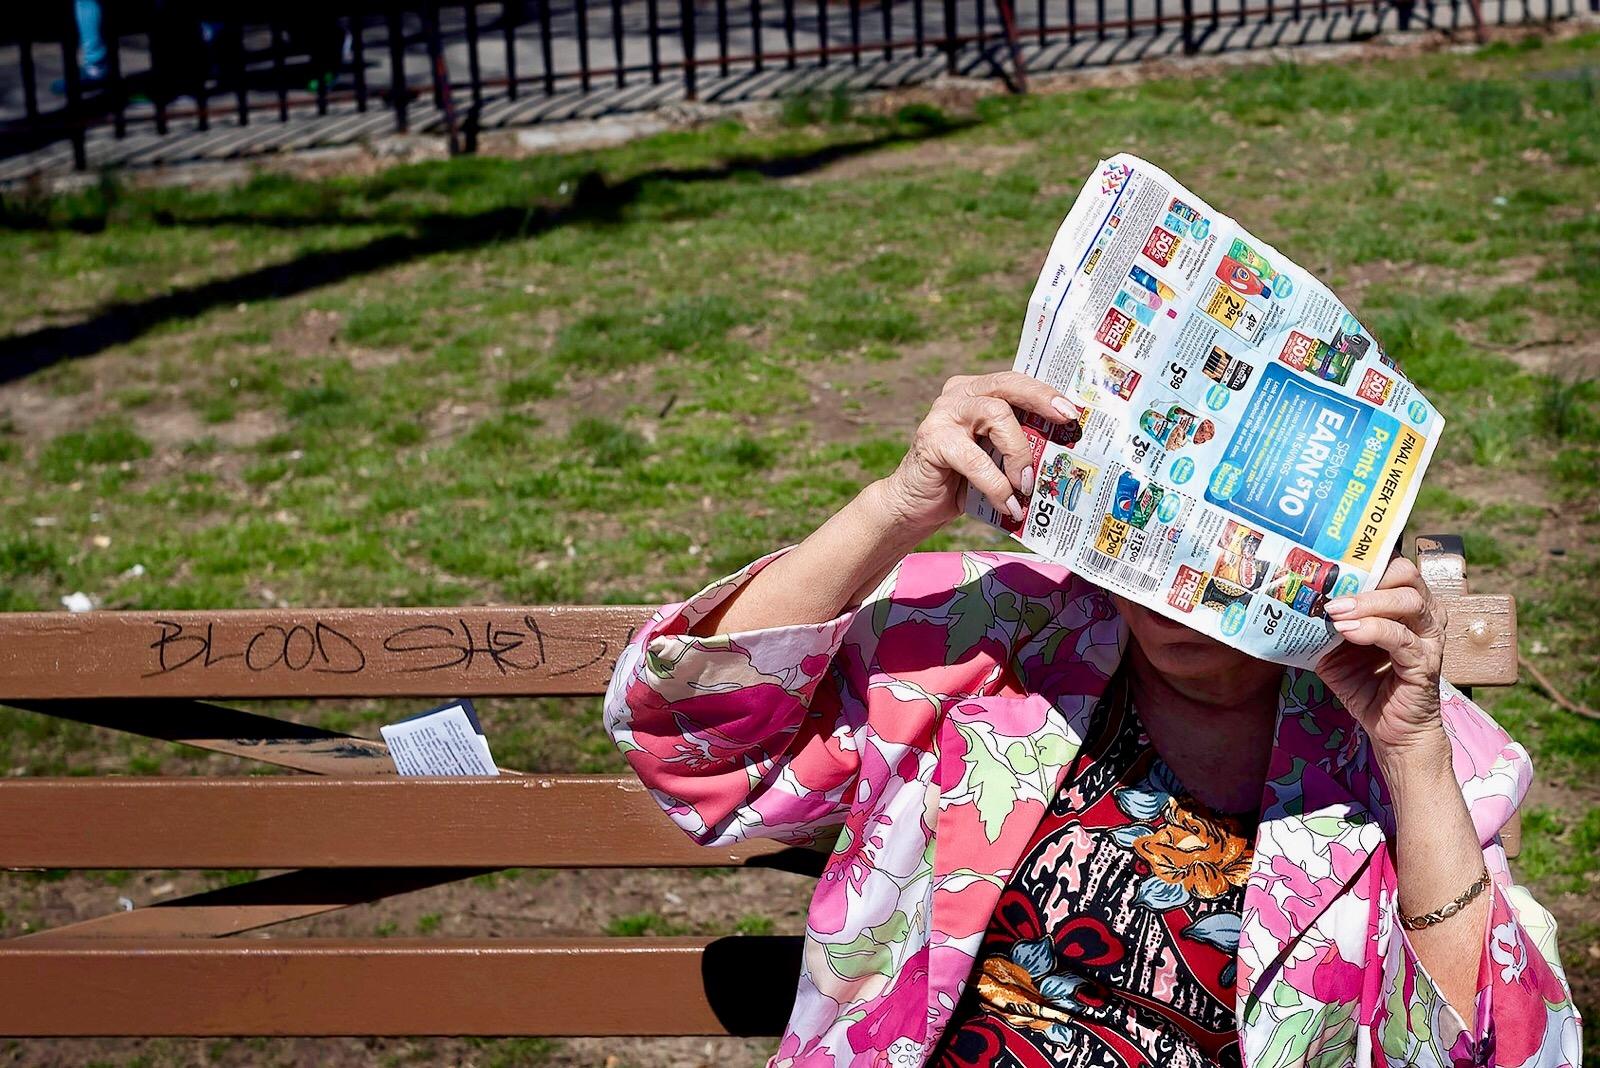 new-york-city-street-photography-collective-frank-multari-4